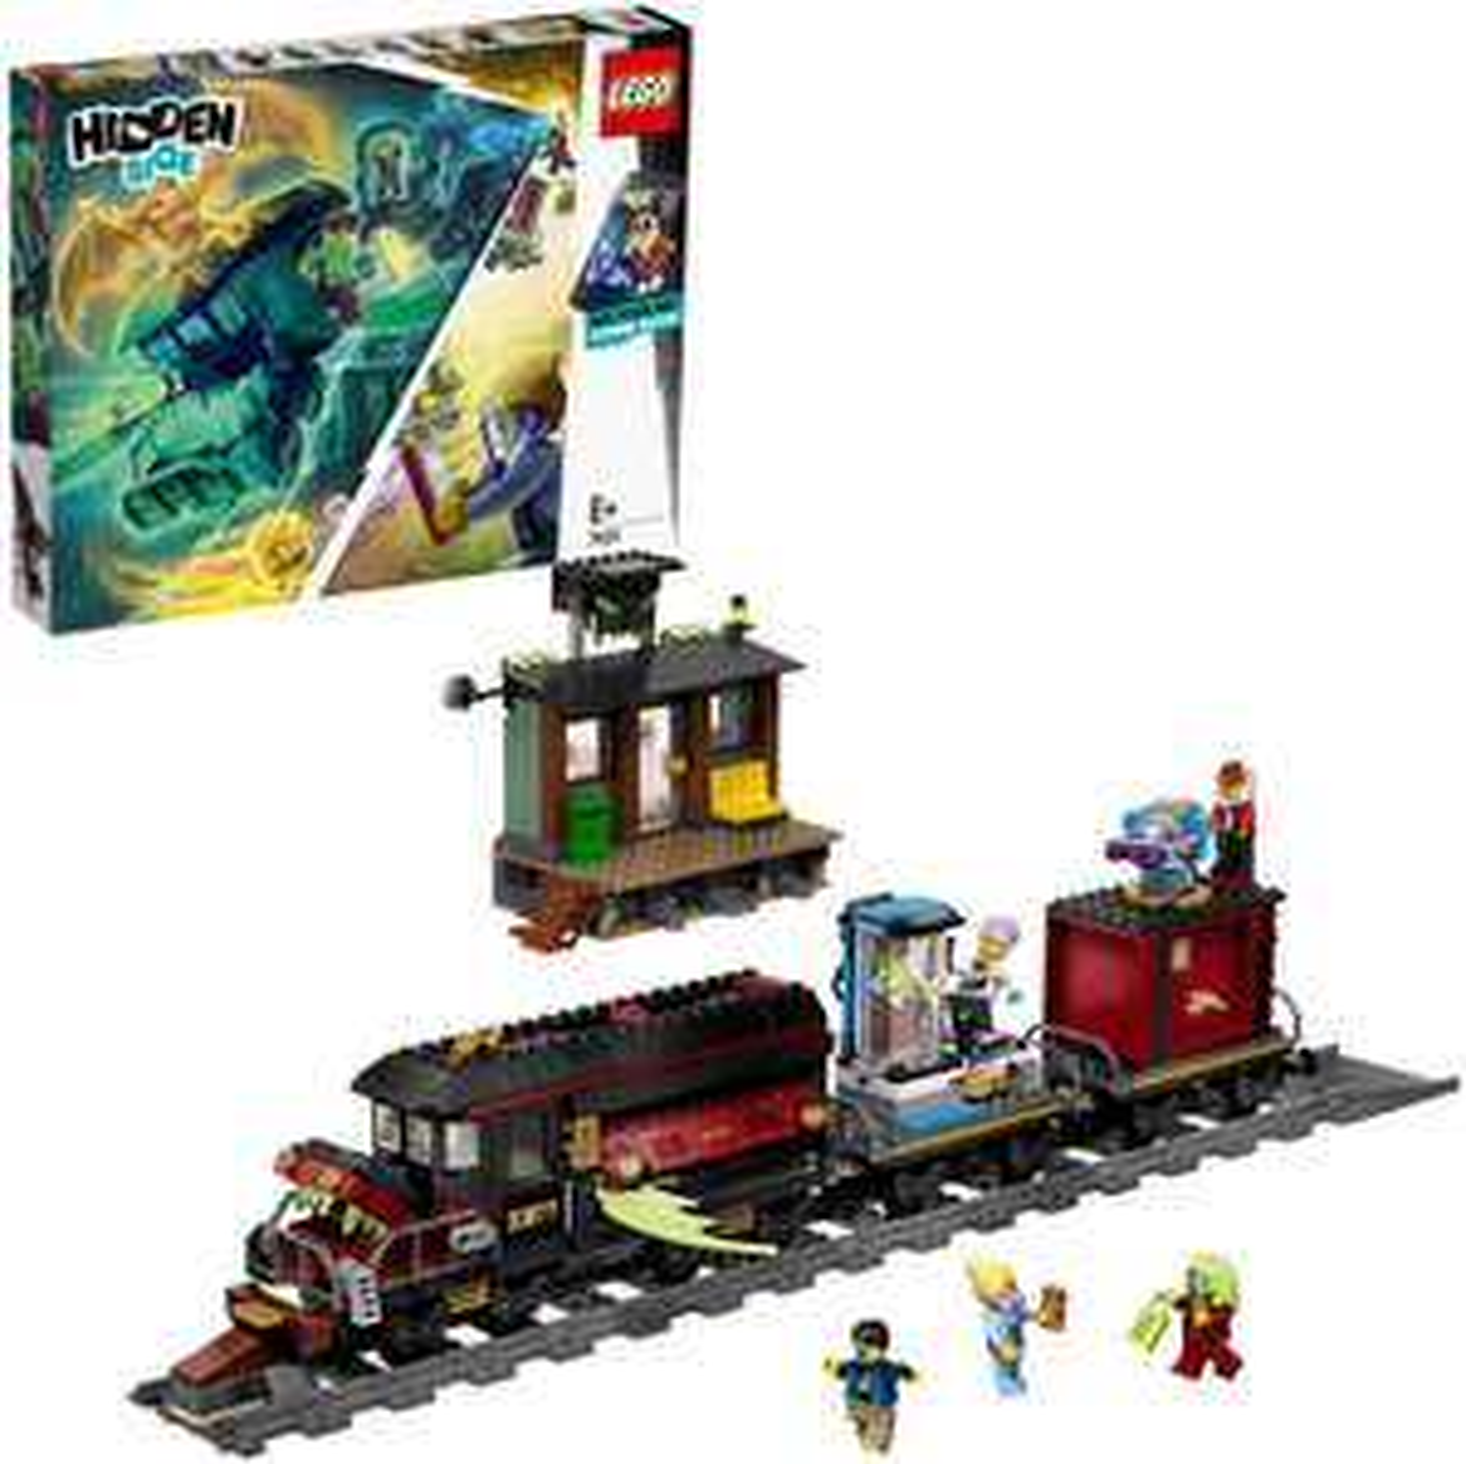 LEGO 70424 Hidden Side Train Express £48.80 at Amazon